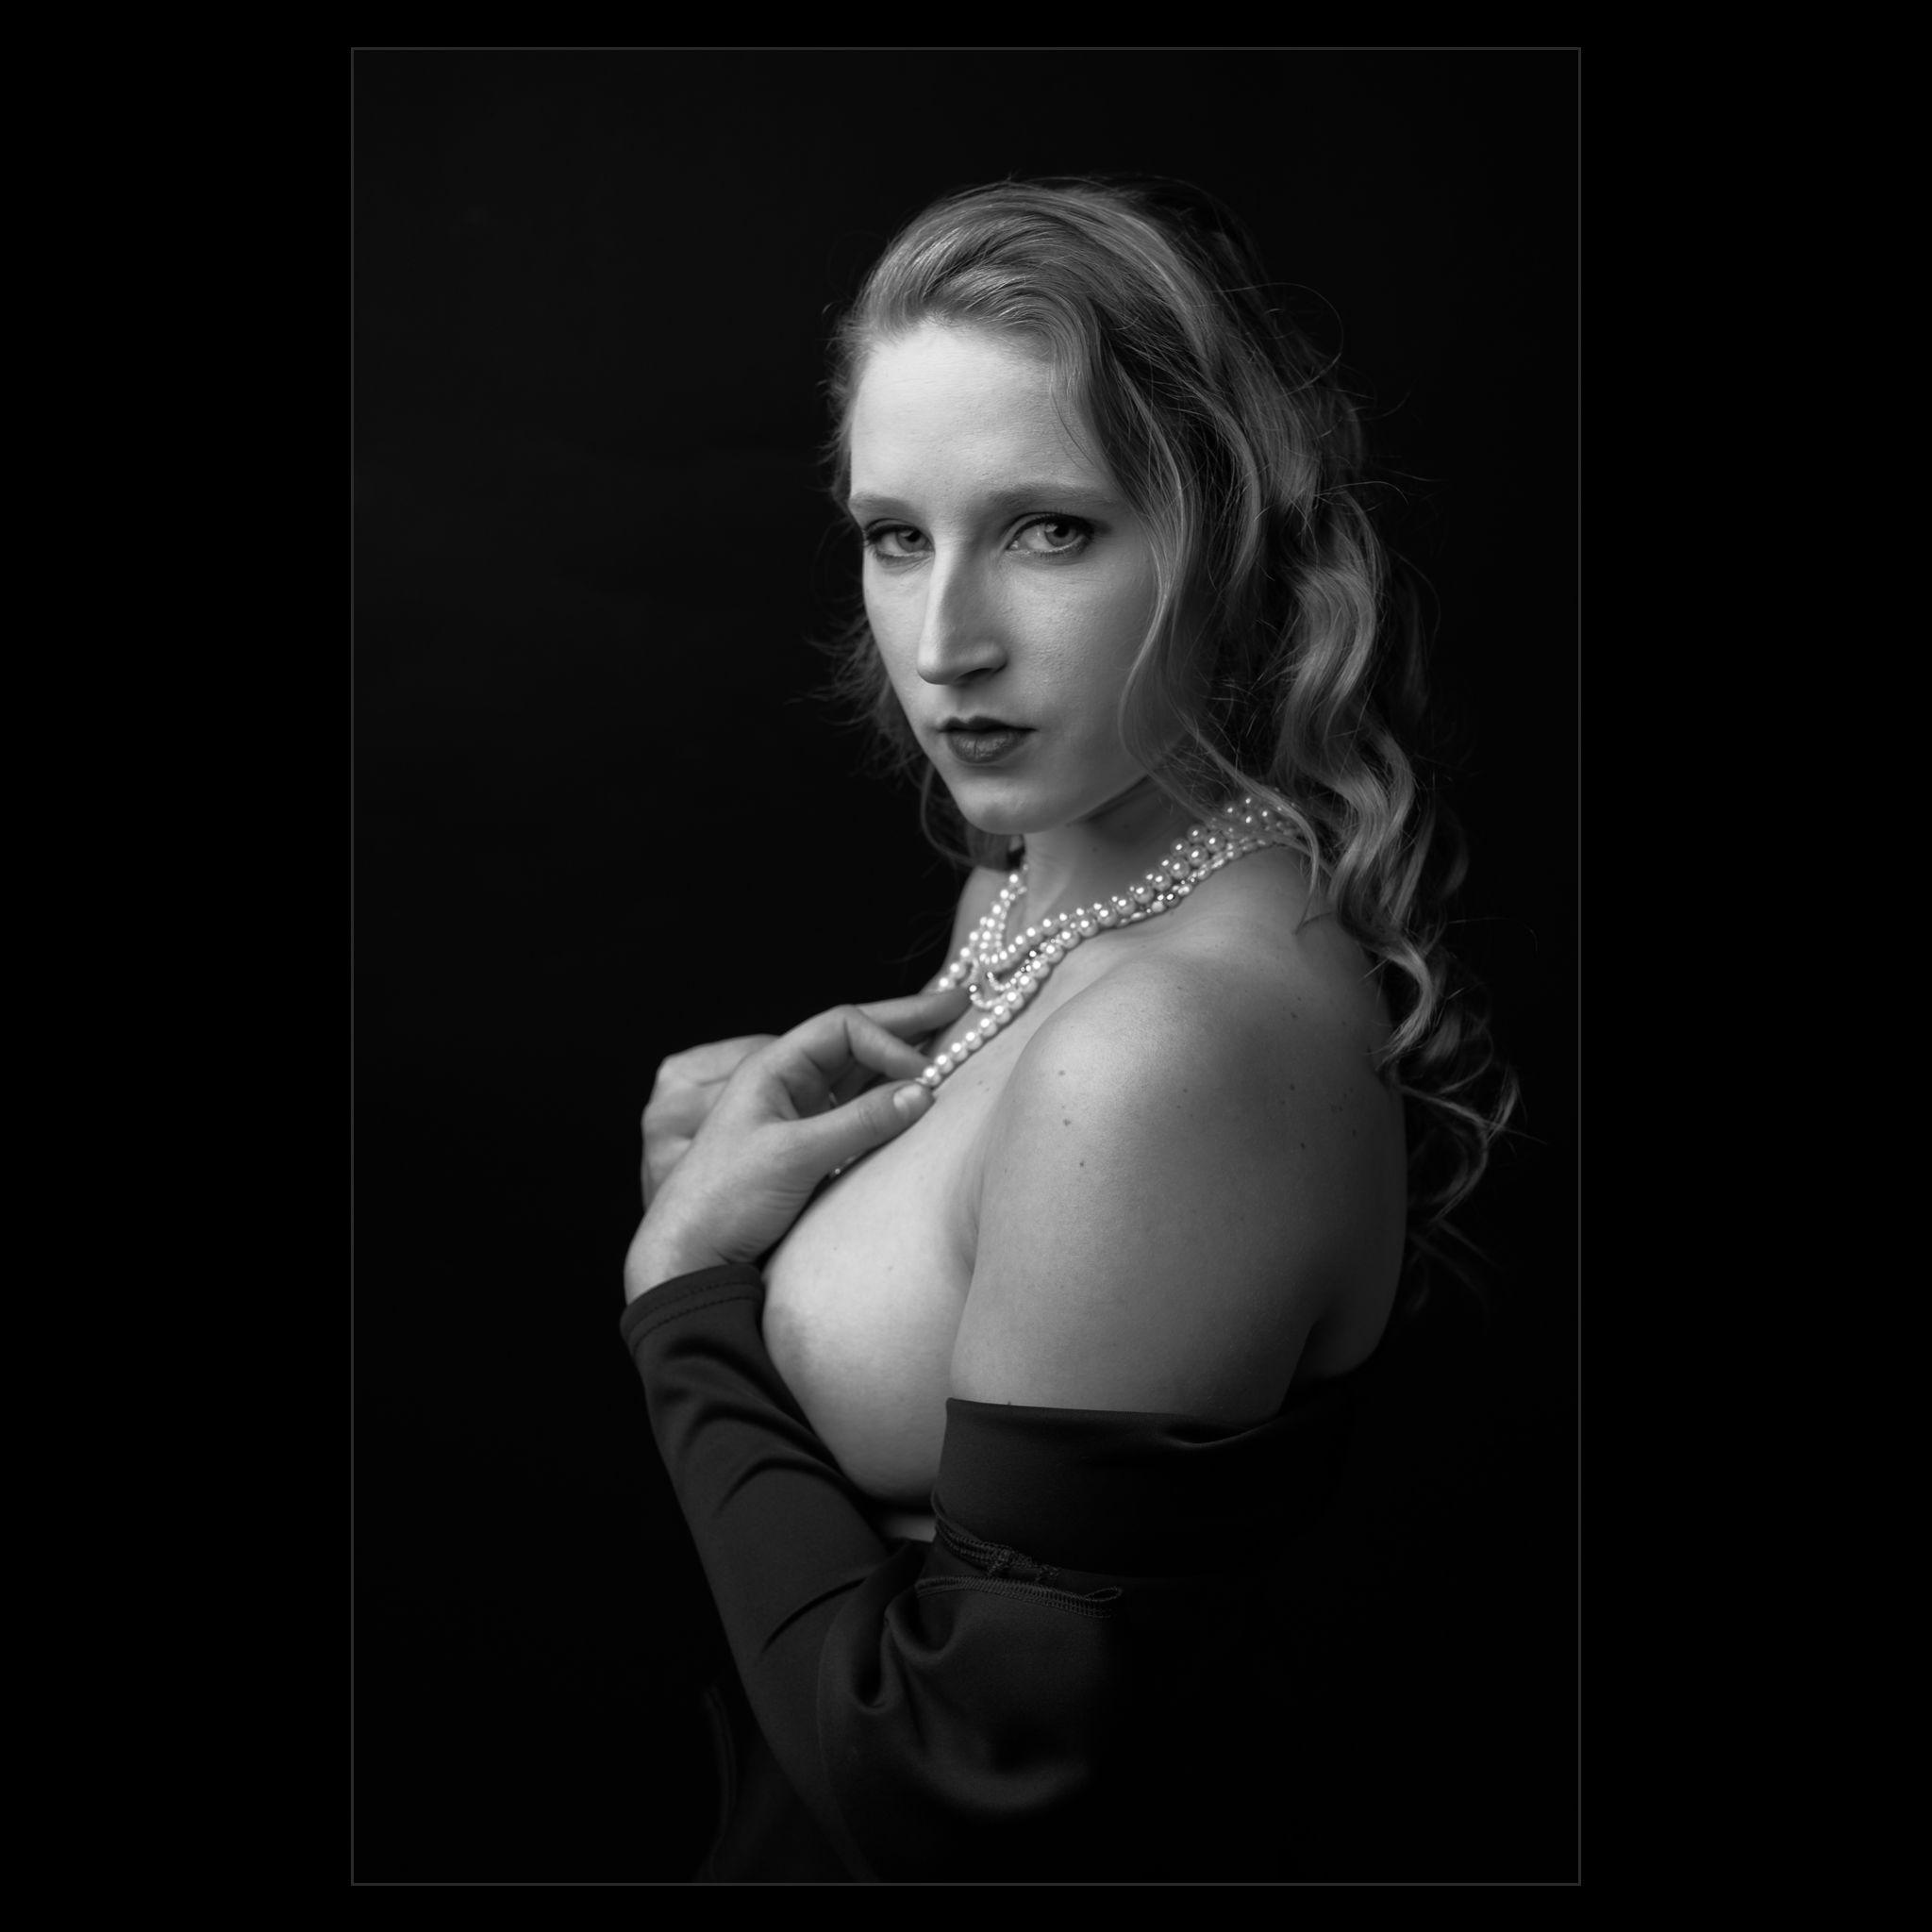 20170117 Bridget Rose - Studio-1008923-Edit.jpg